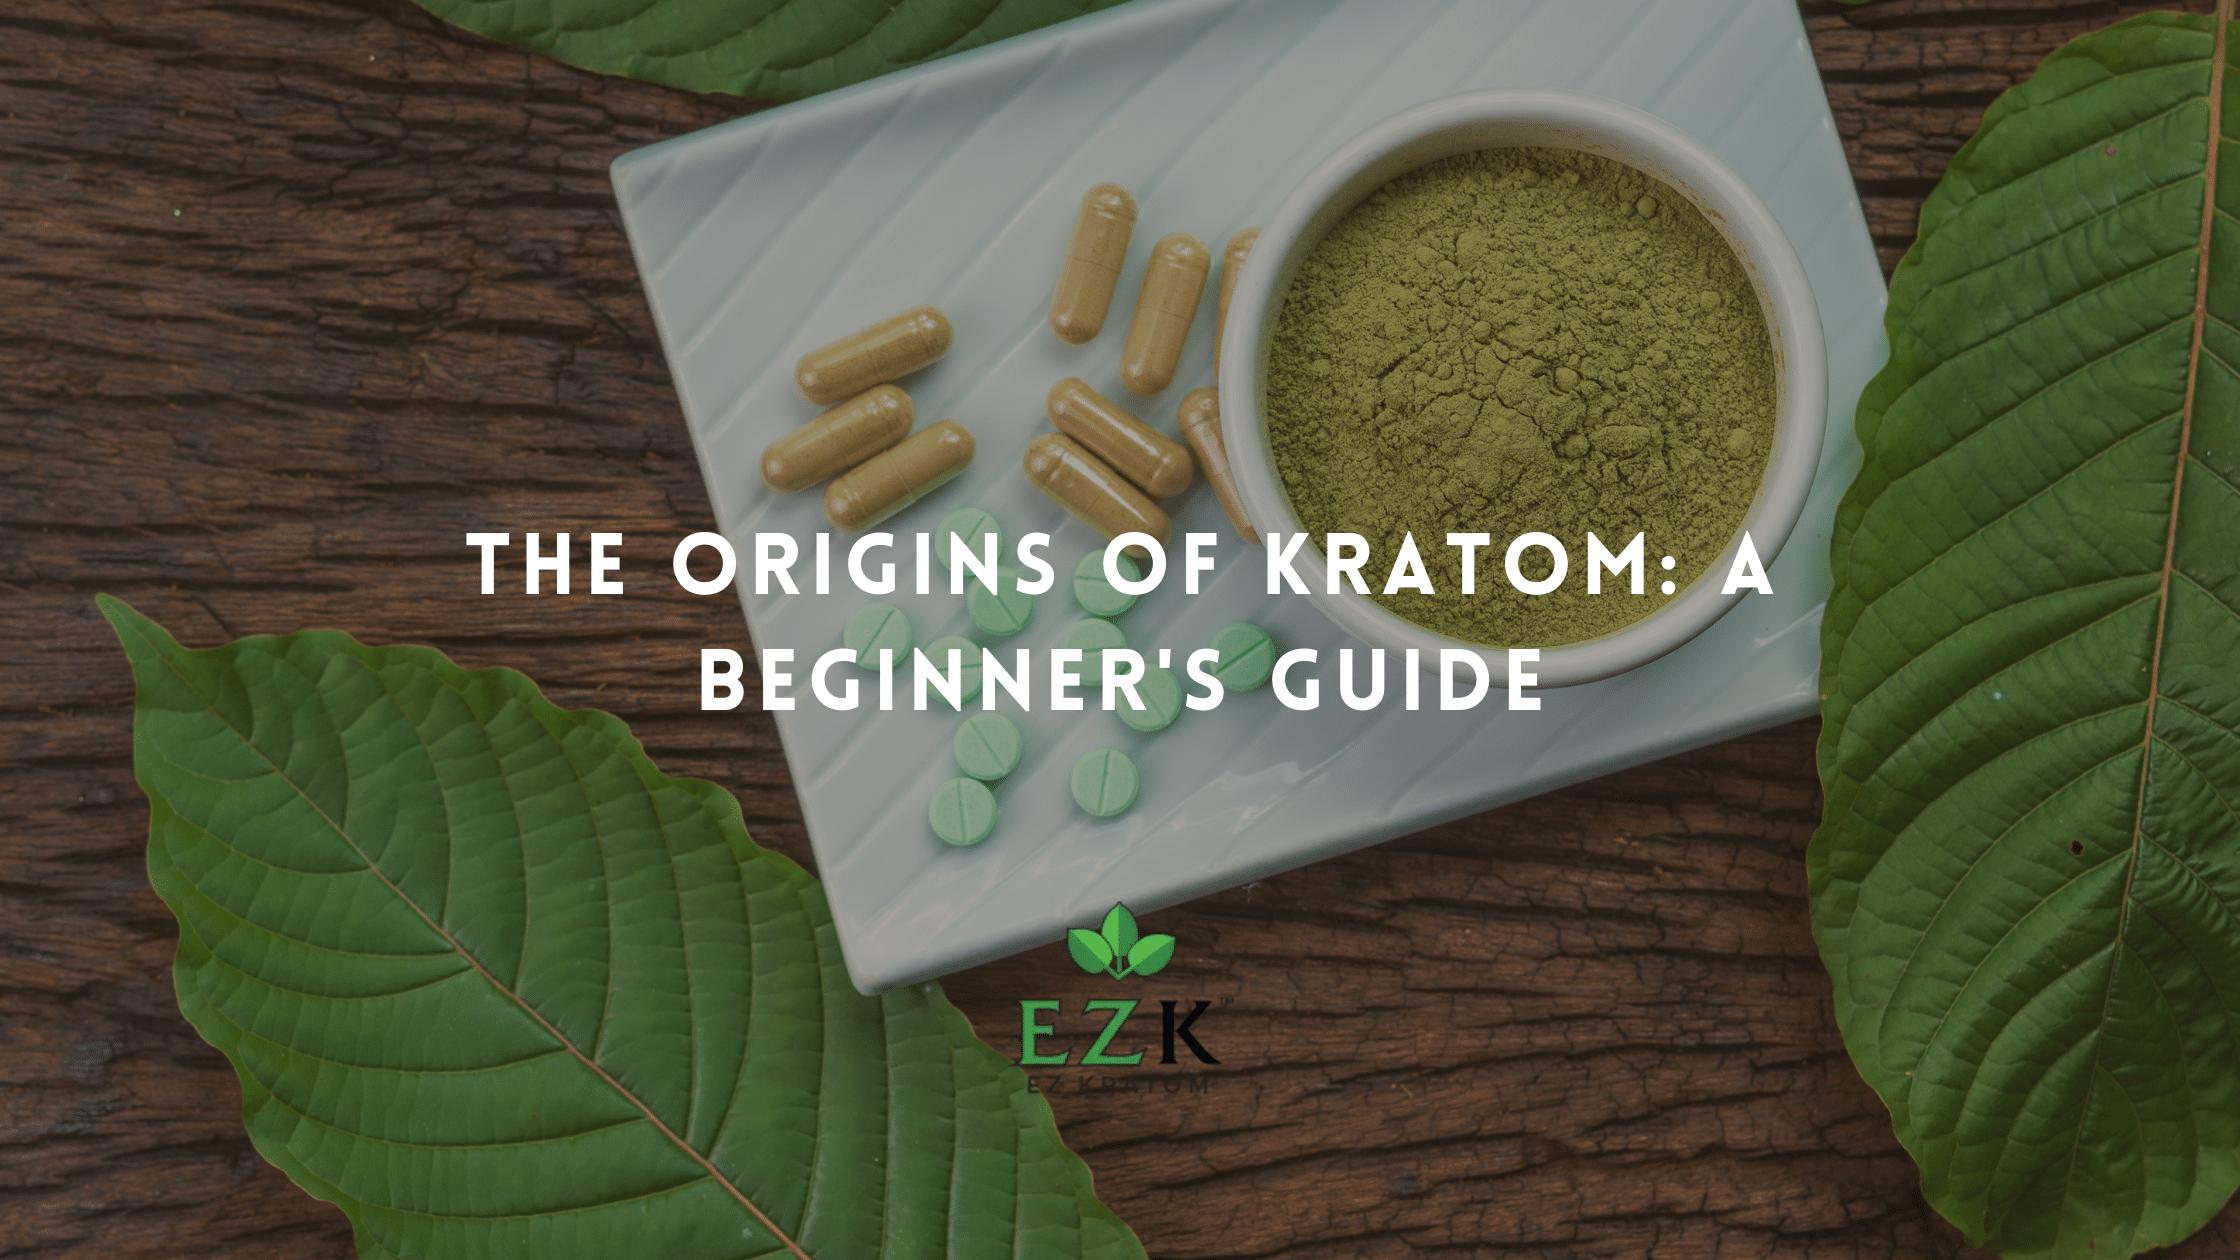 The Origins of Kratom A Beginner's Guide